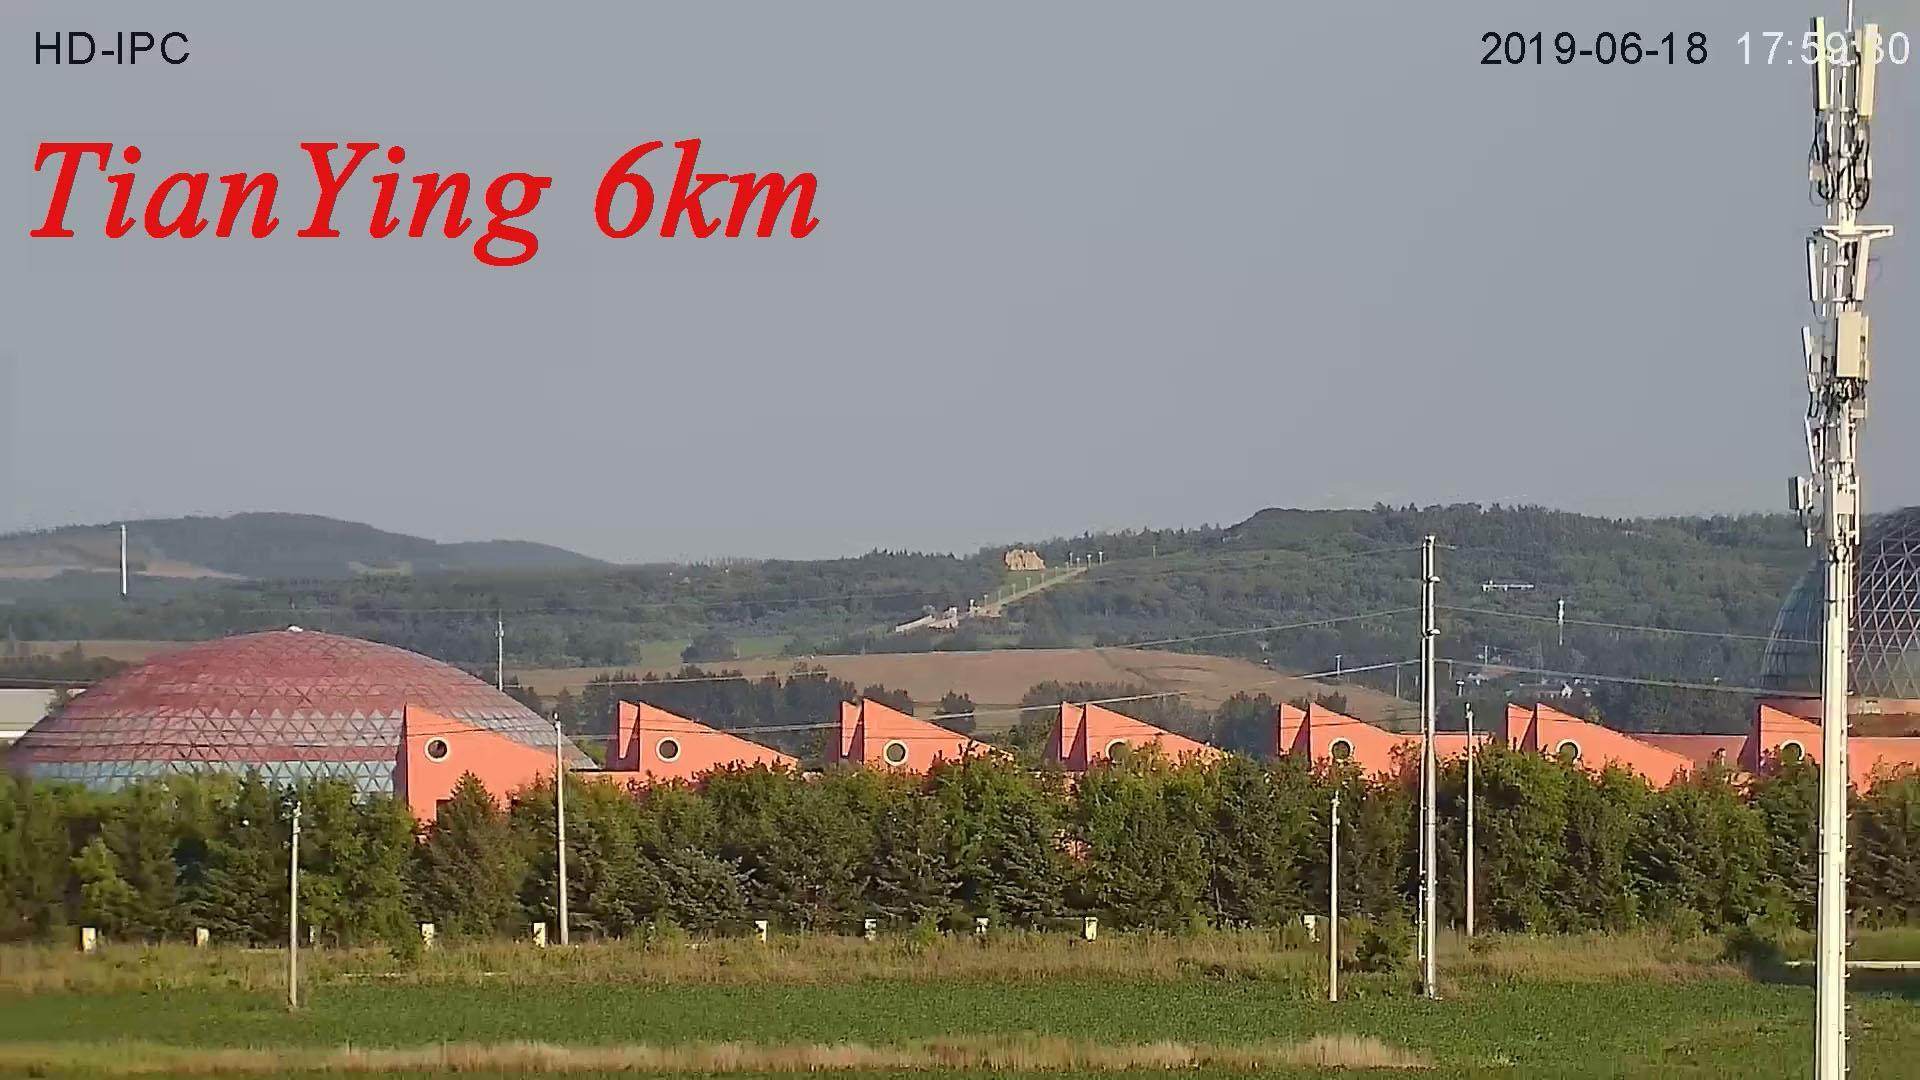 20km Tank Thermal Camera Surveillance Electro-Optic System 10